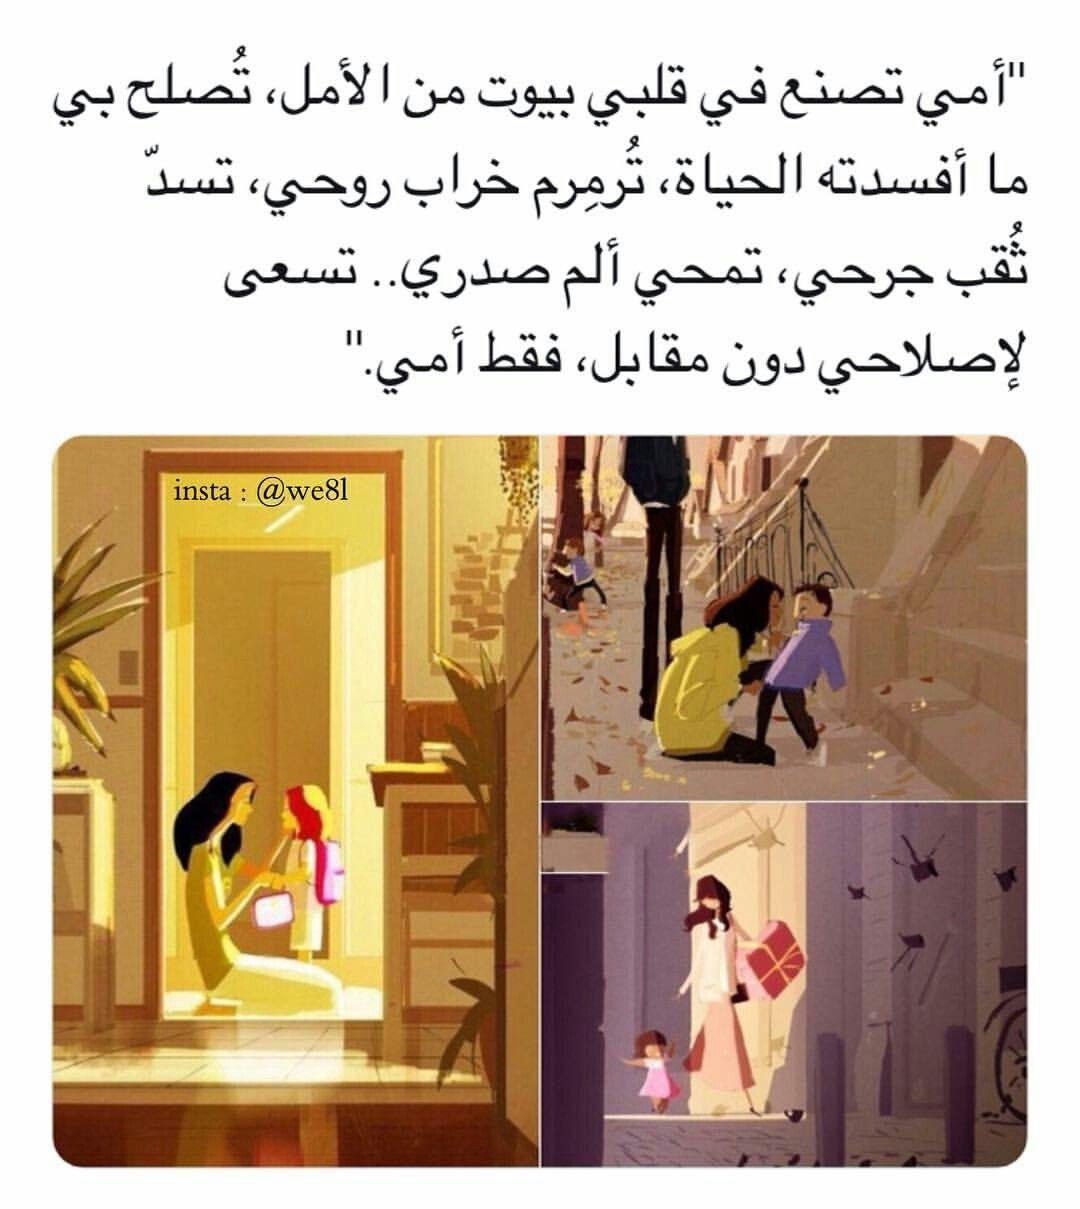 Pin By فلسطينية On أمي الحب و حنان الكون الذي يمشي على قدمين Beautiful Arabic Words Mother Quotes Mom Quotes